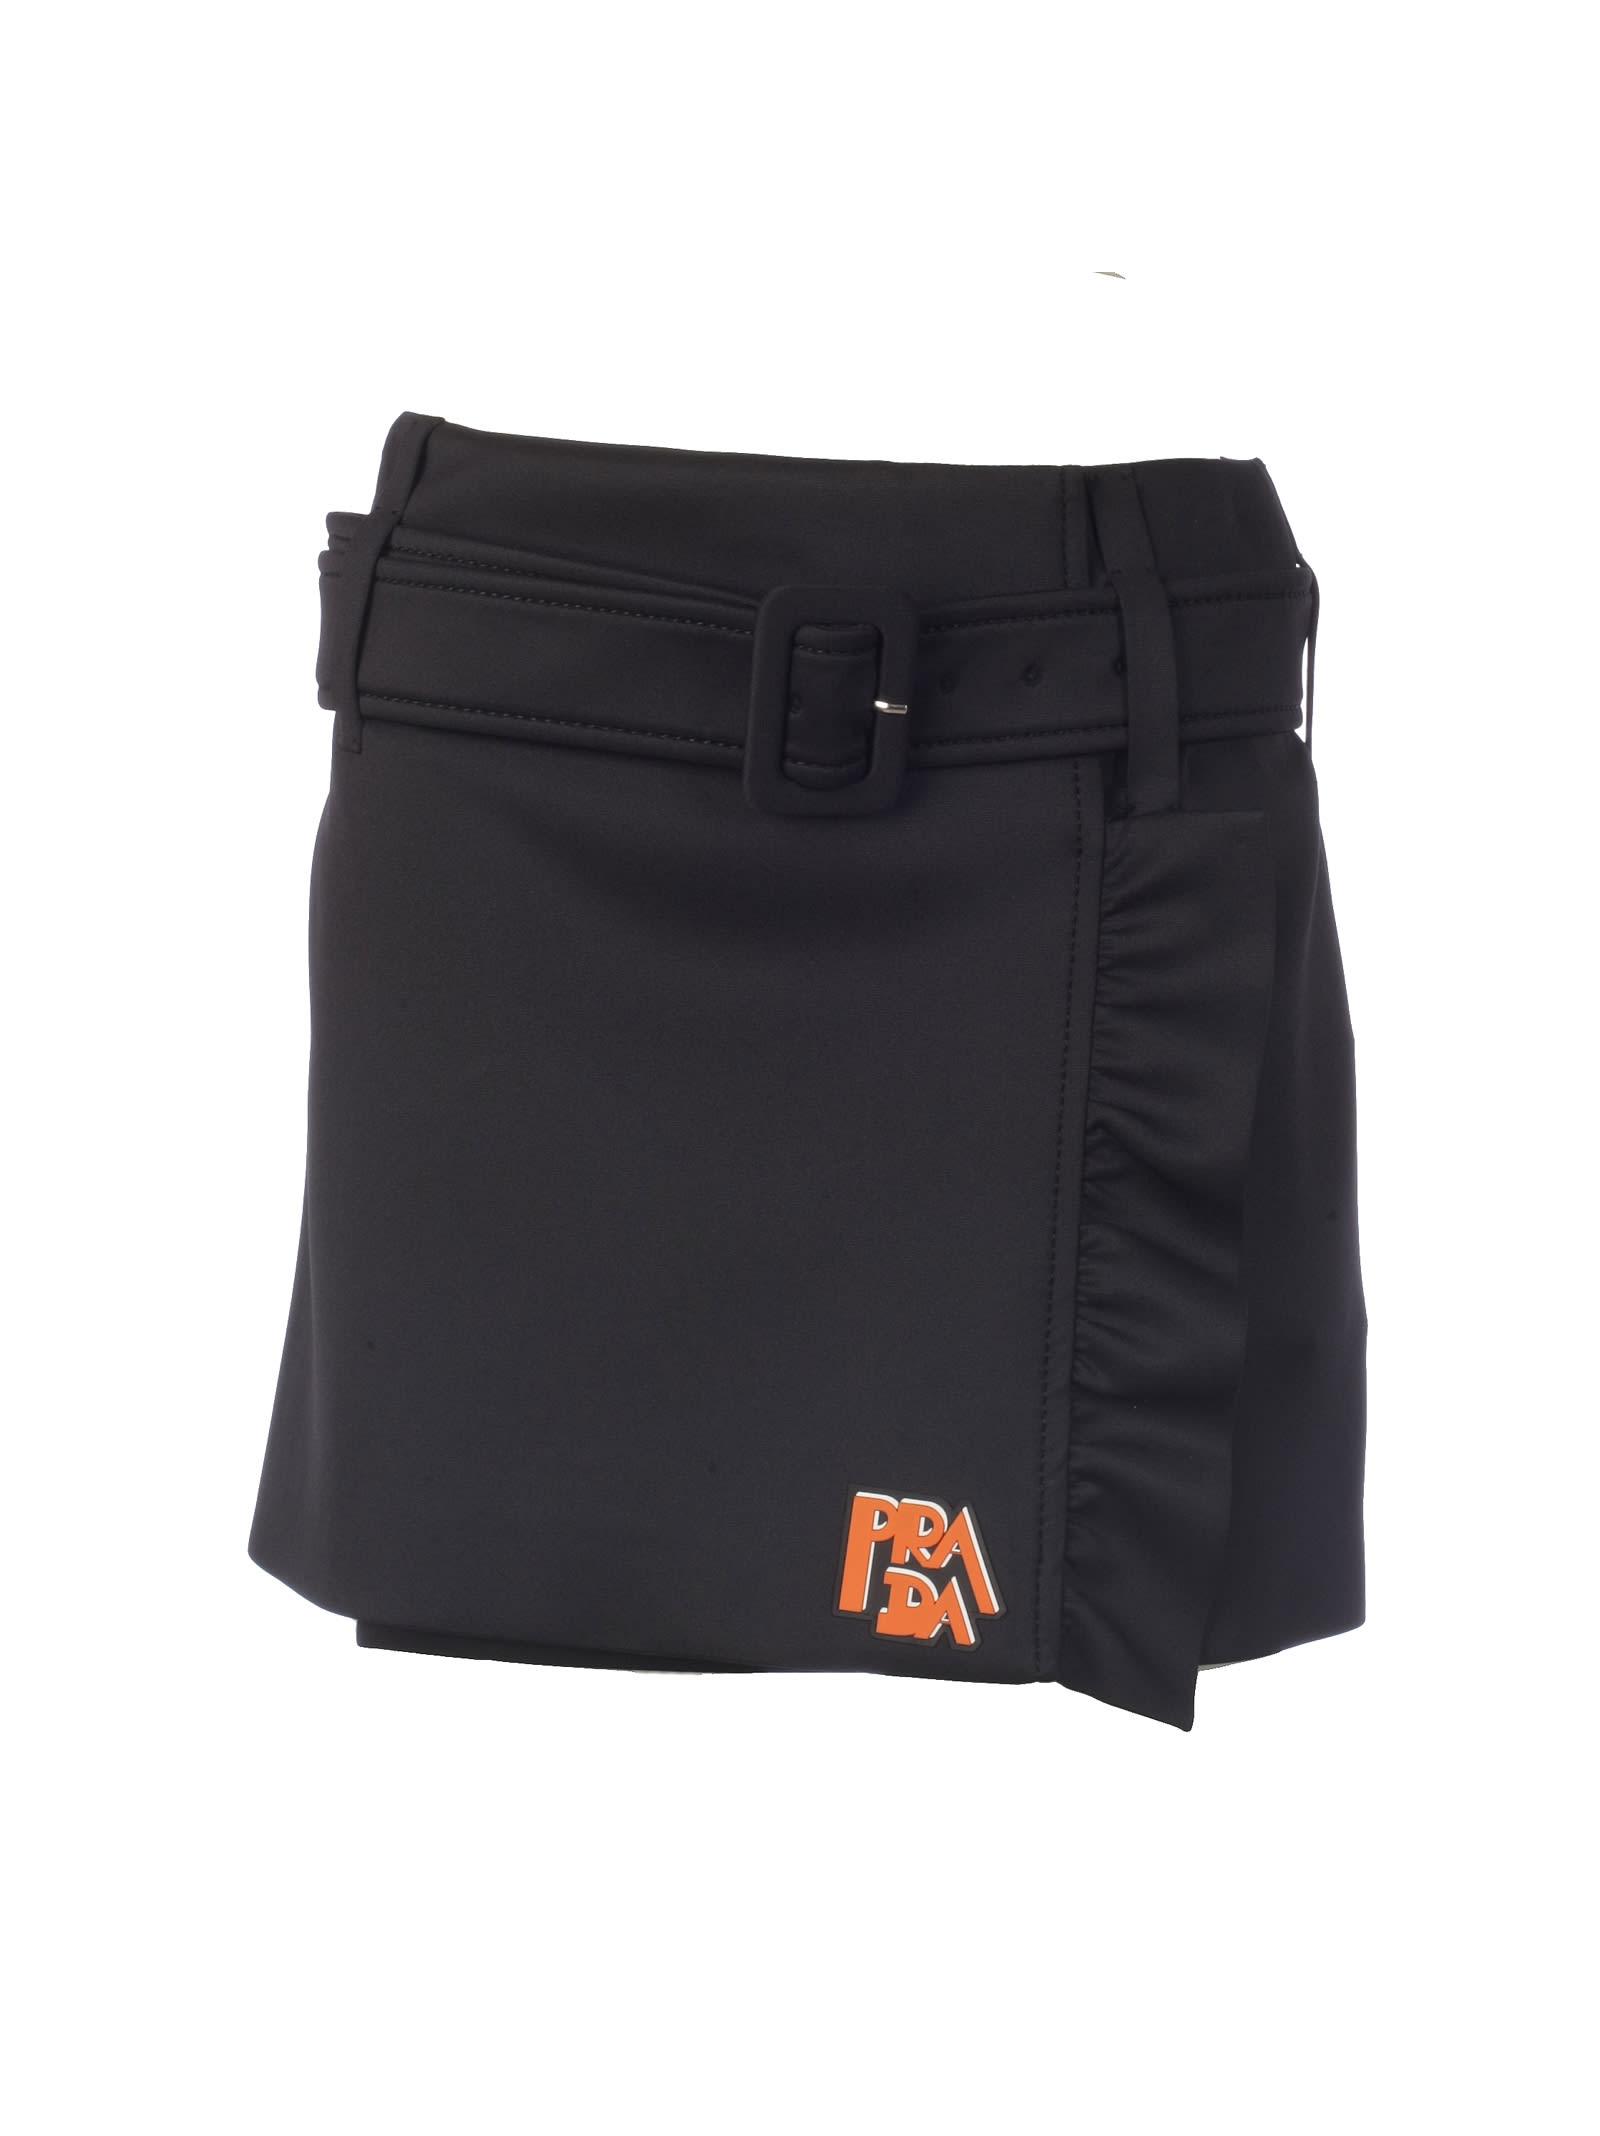 8efcb1f1268b5 Prada Ruffled Mini Skirt